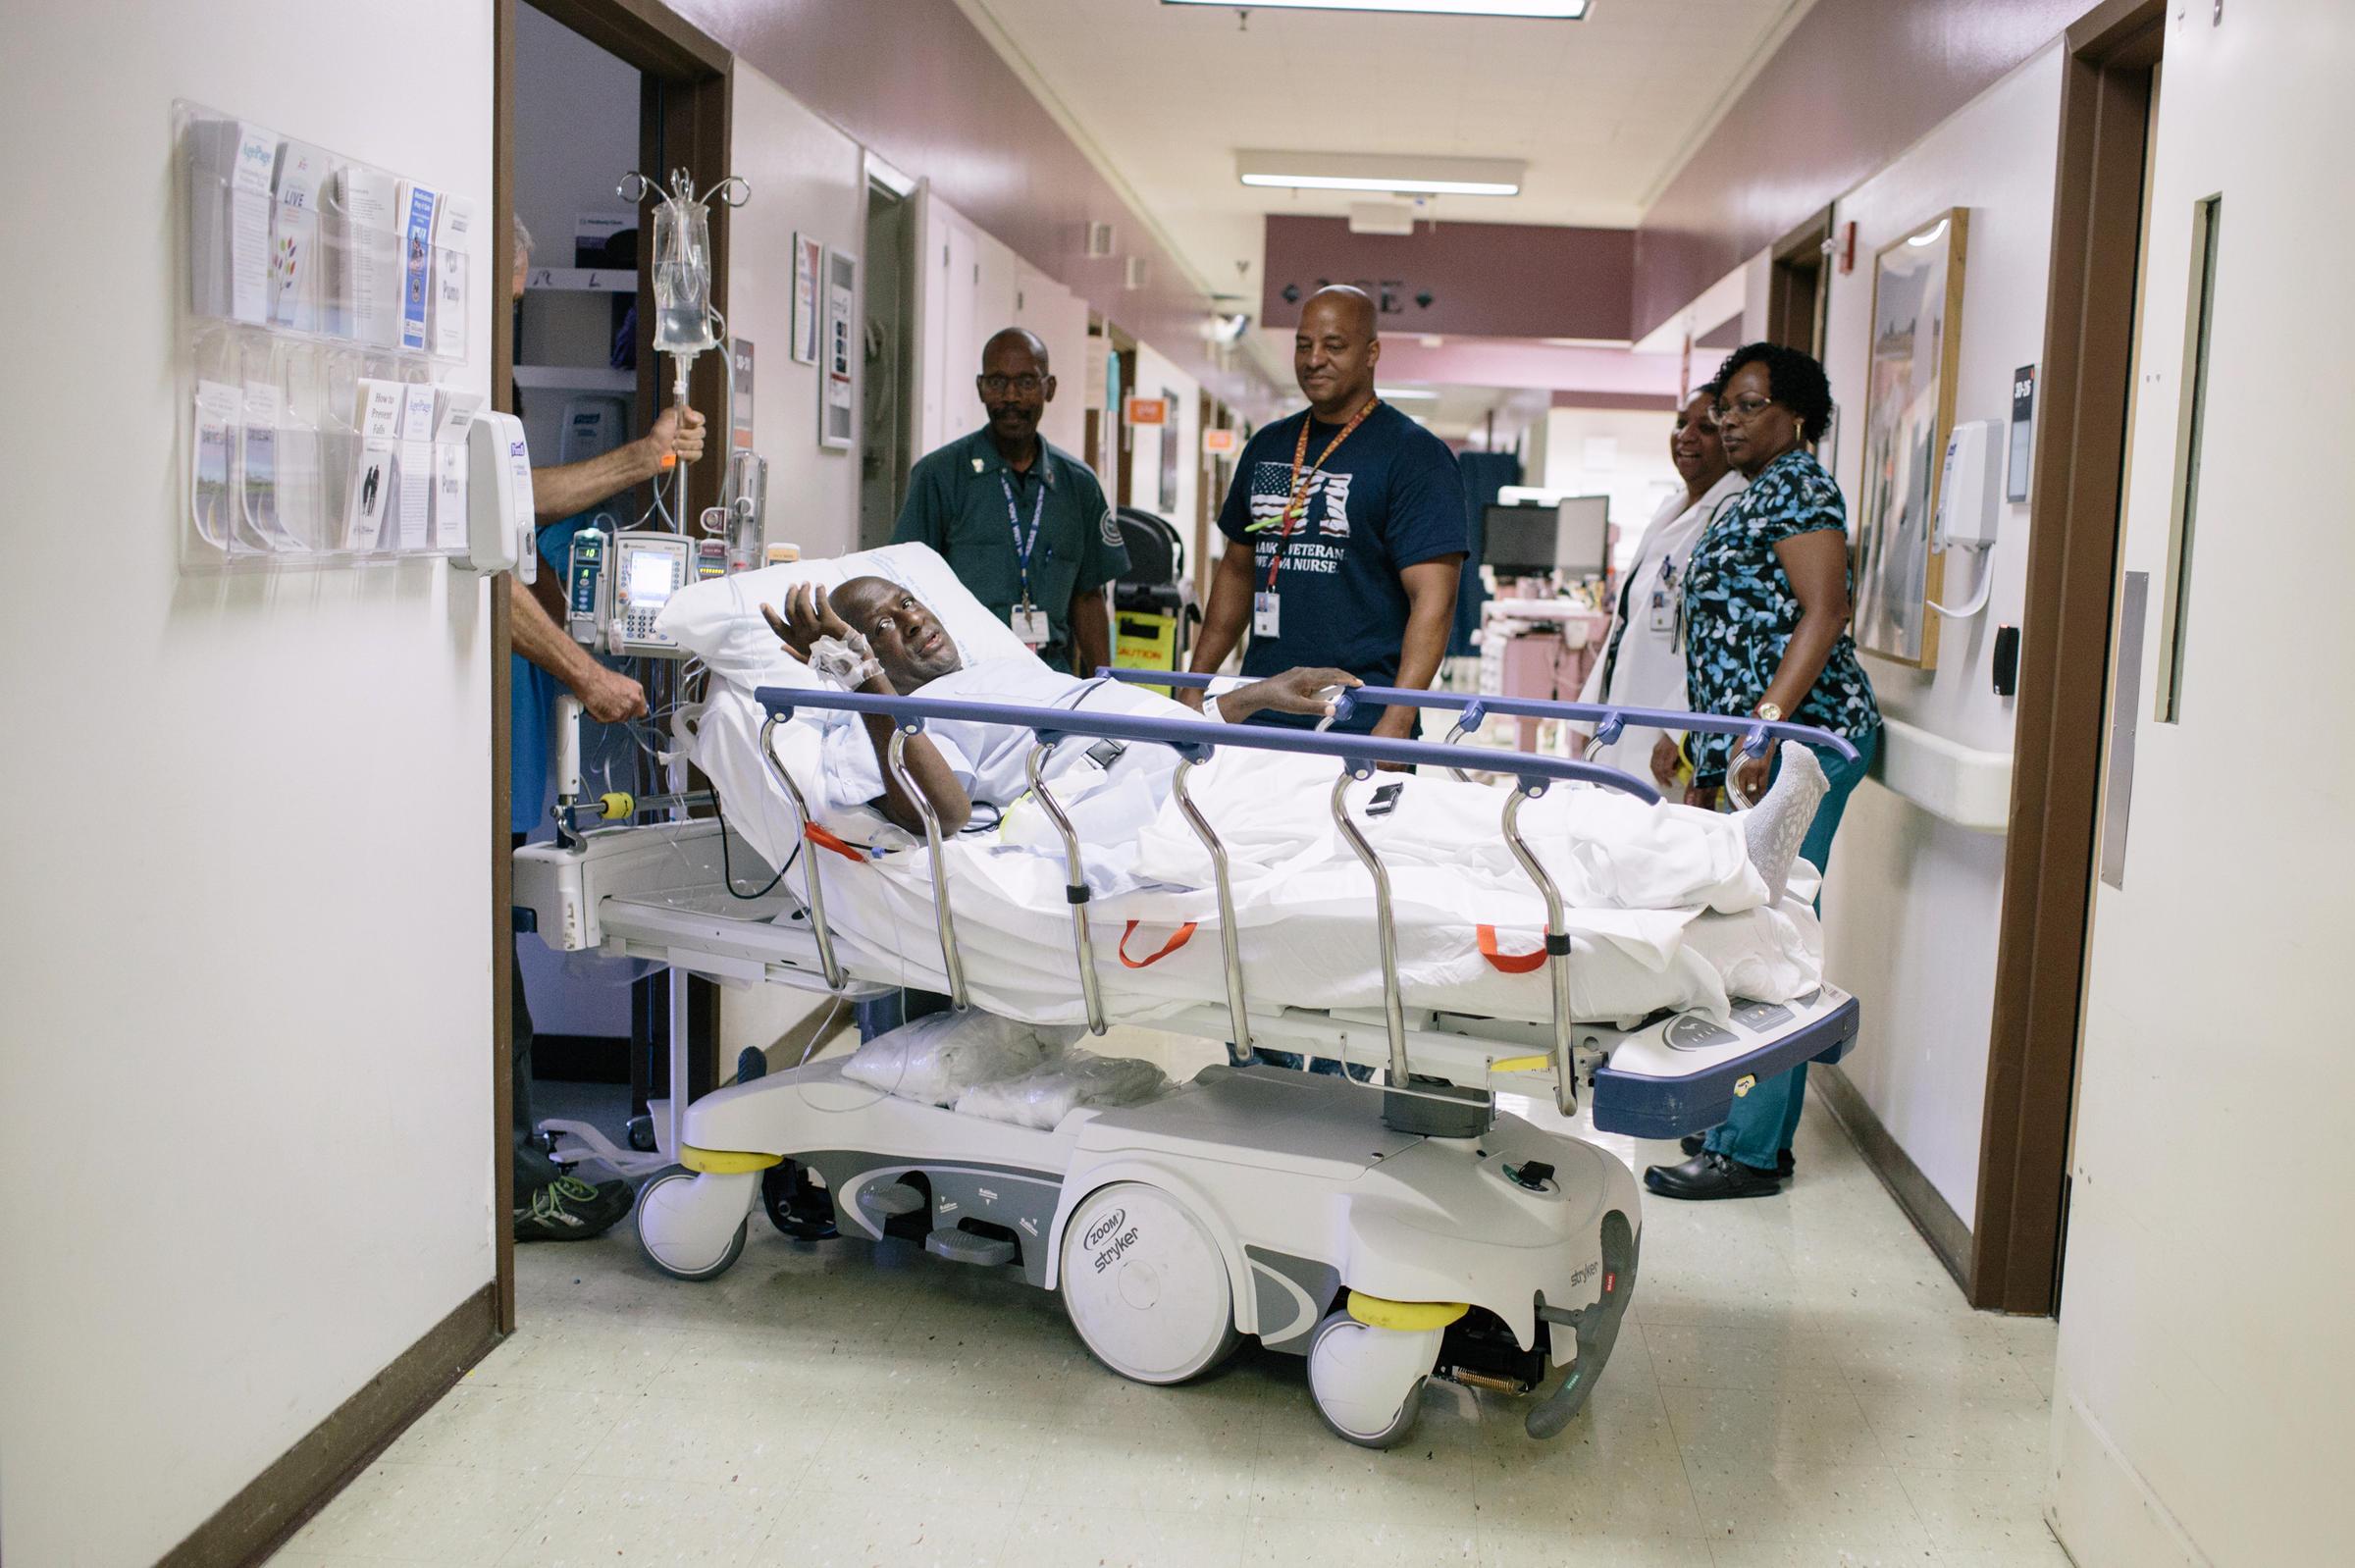 Va Hospital Emergency Room